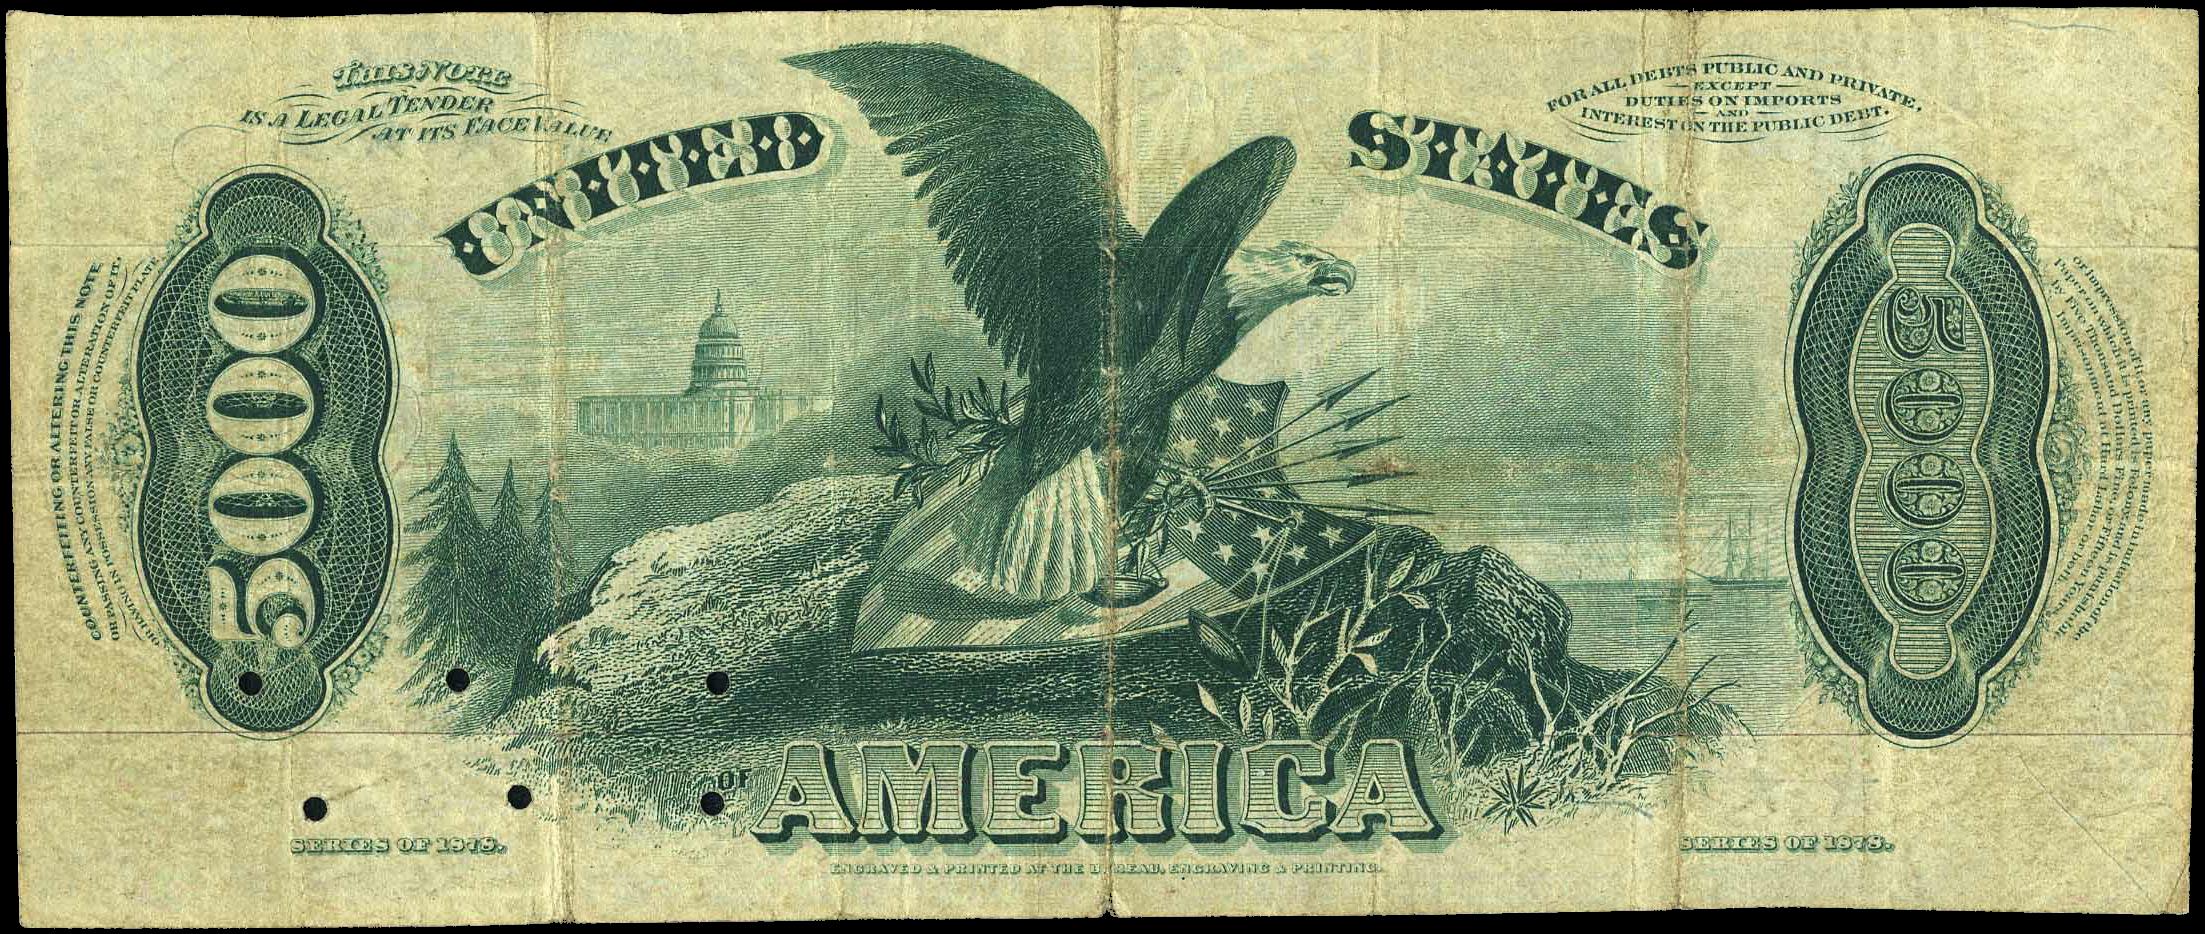 File:5000 Dollar 1878 US Legal Tender reverse.png.